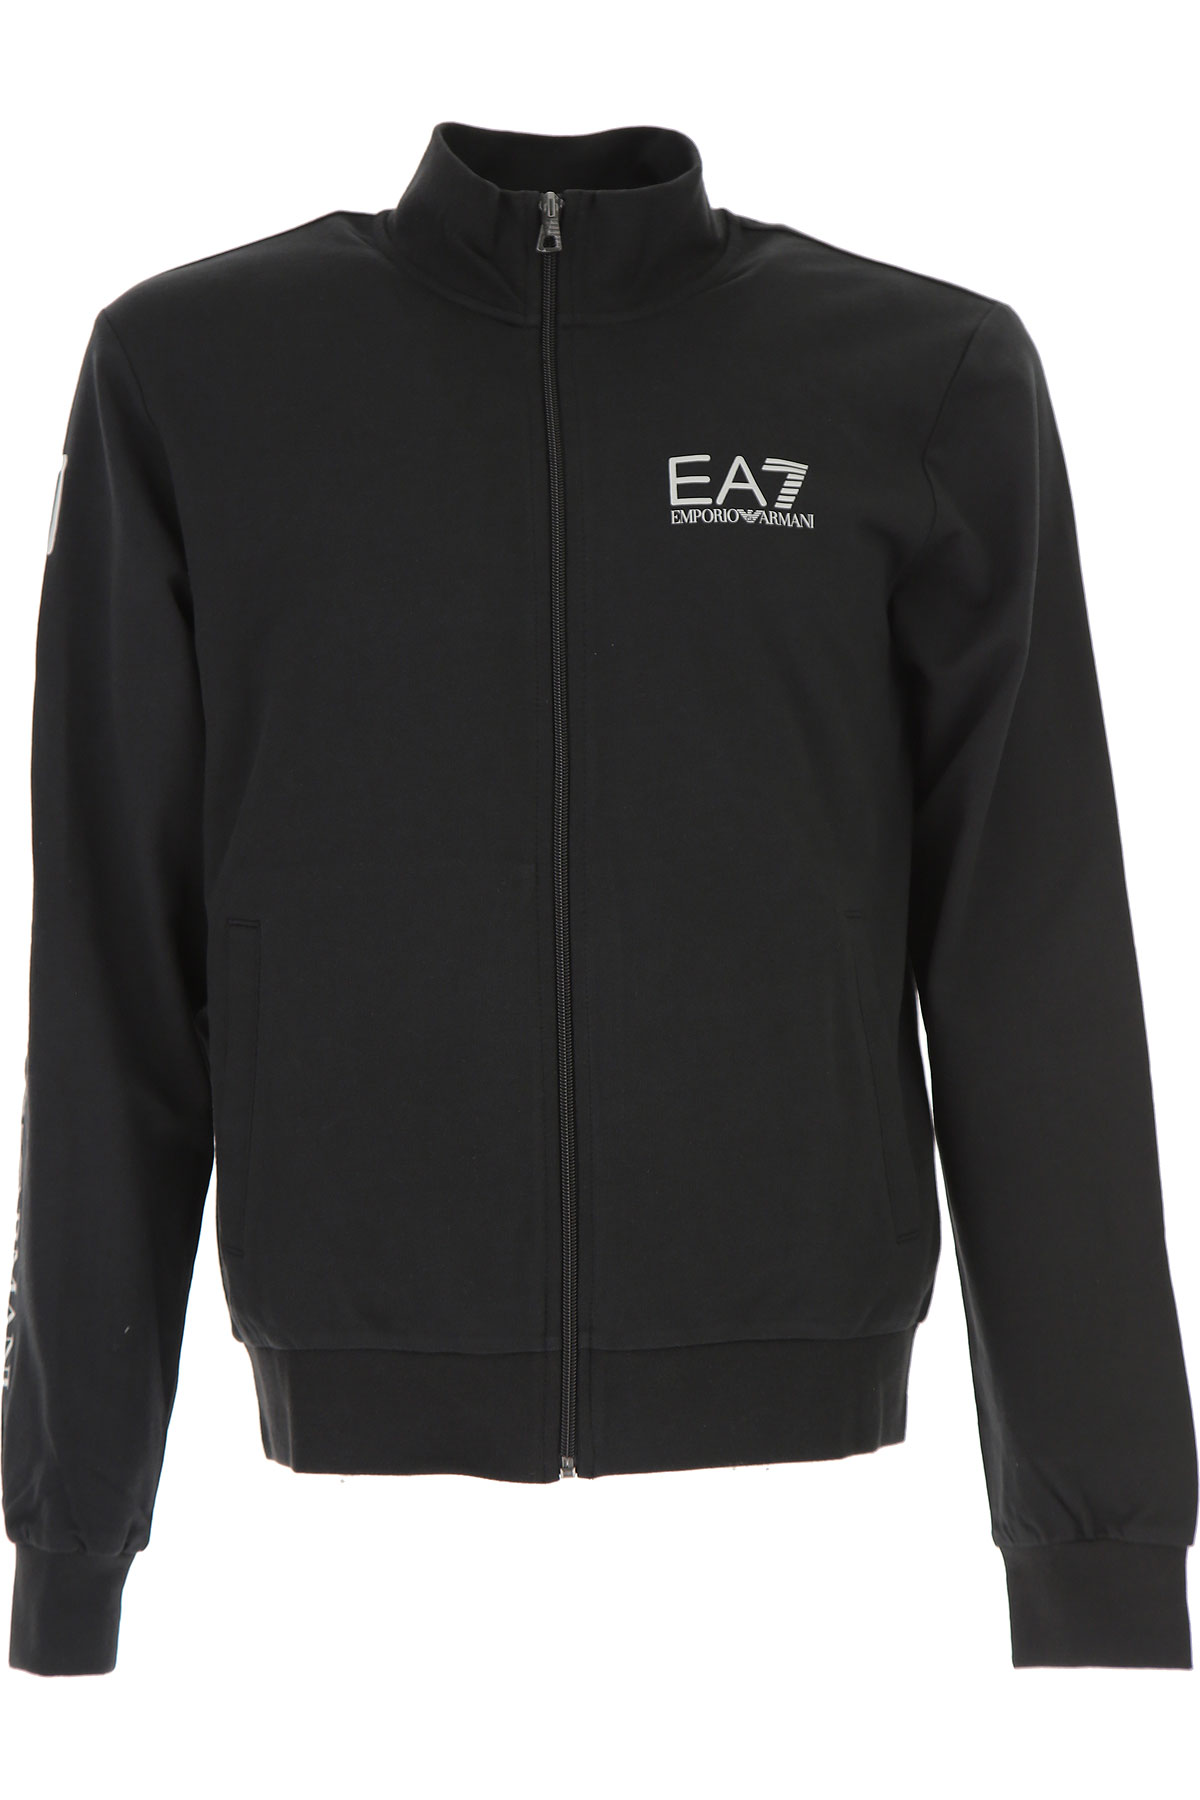 Emporio Armani Sweatshirt for Men On Sale, Black, Cotton, 2017, XL XXL USA-460207